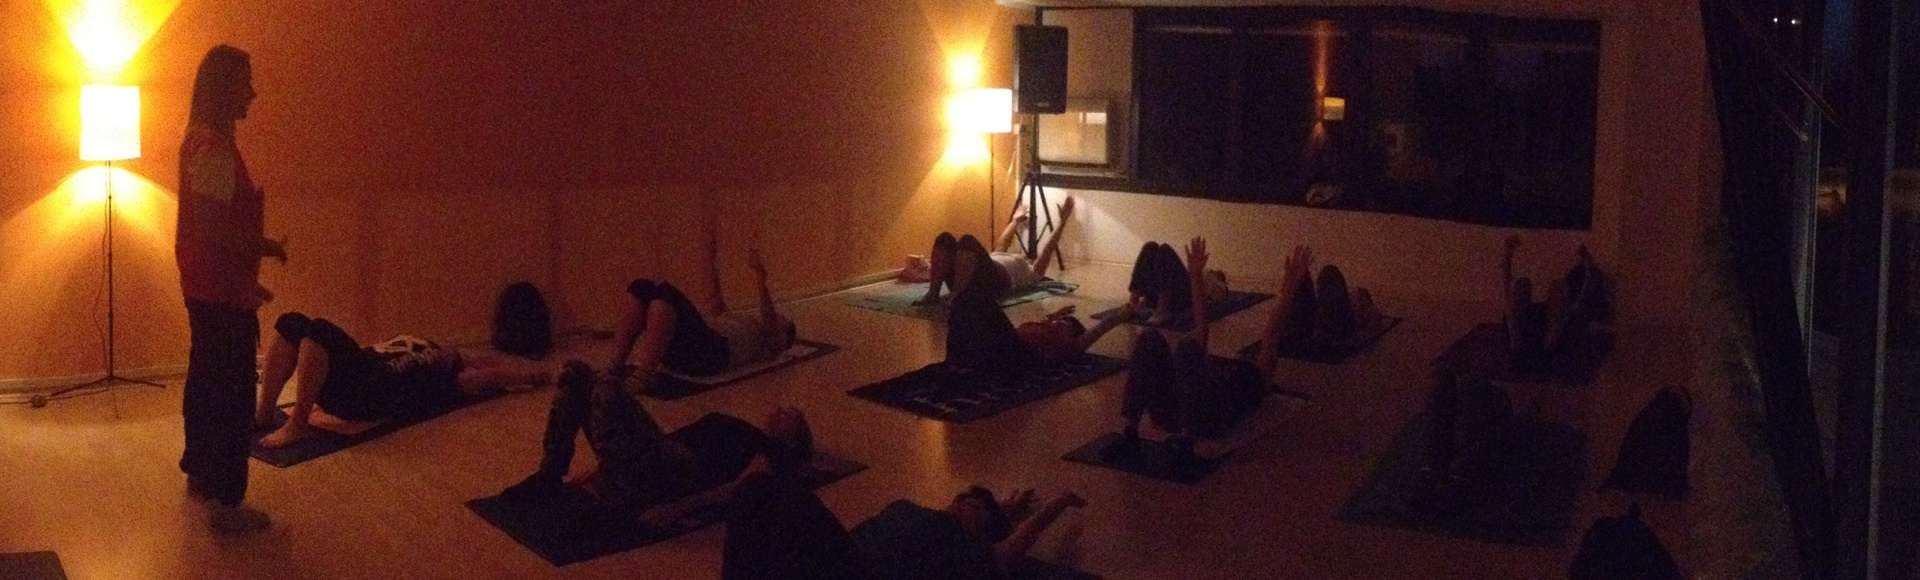 yoga, pilates, posturale...